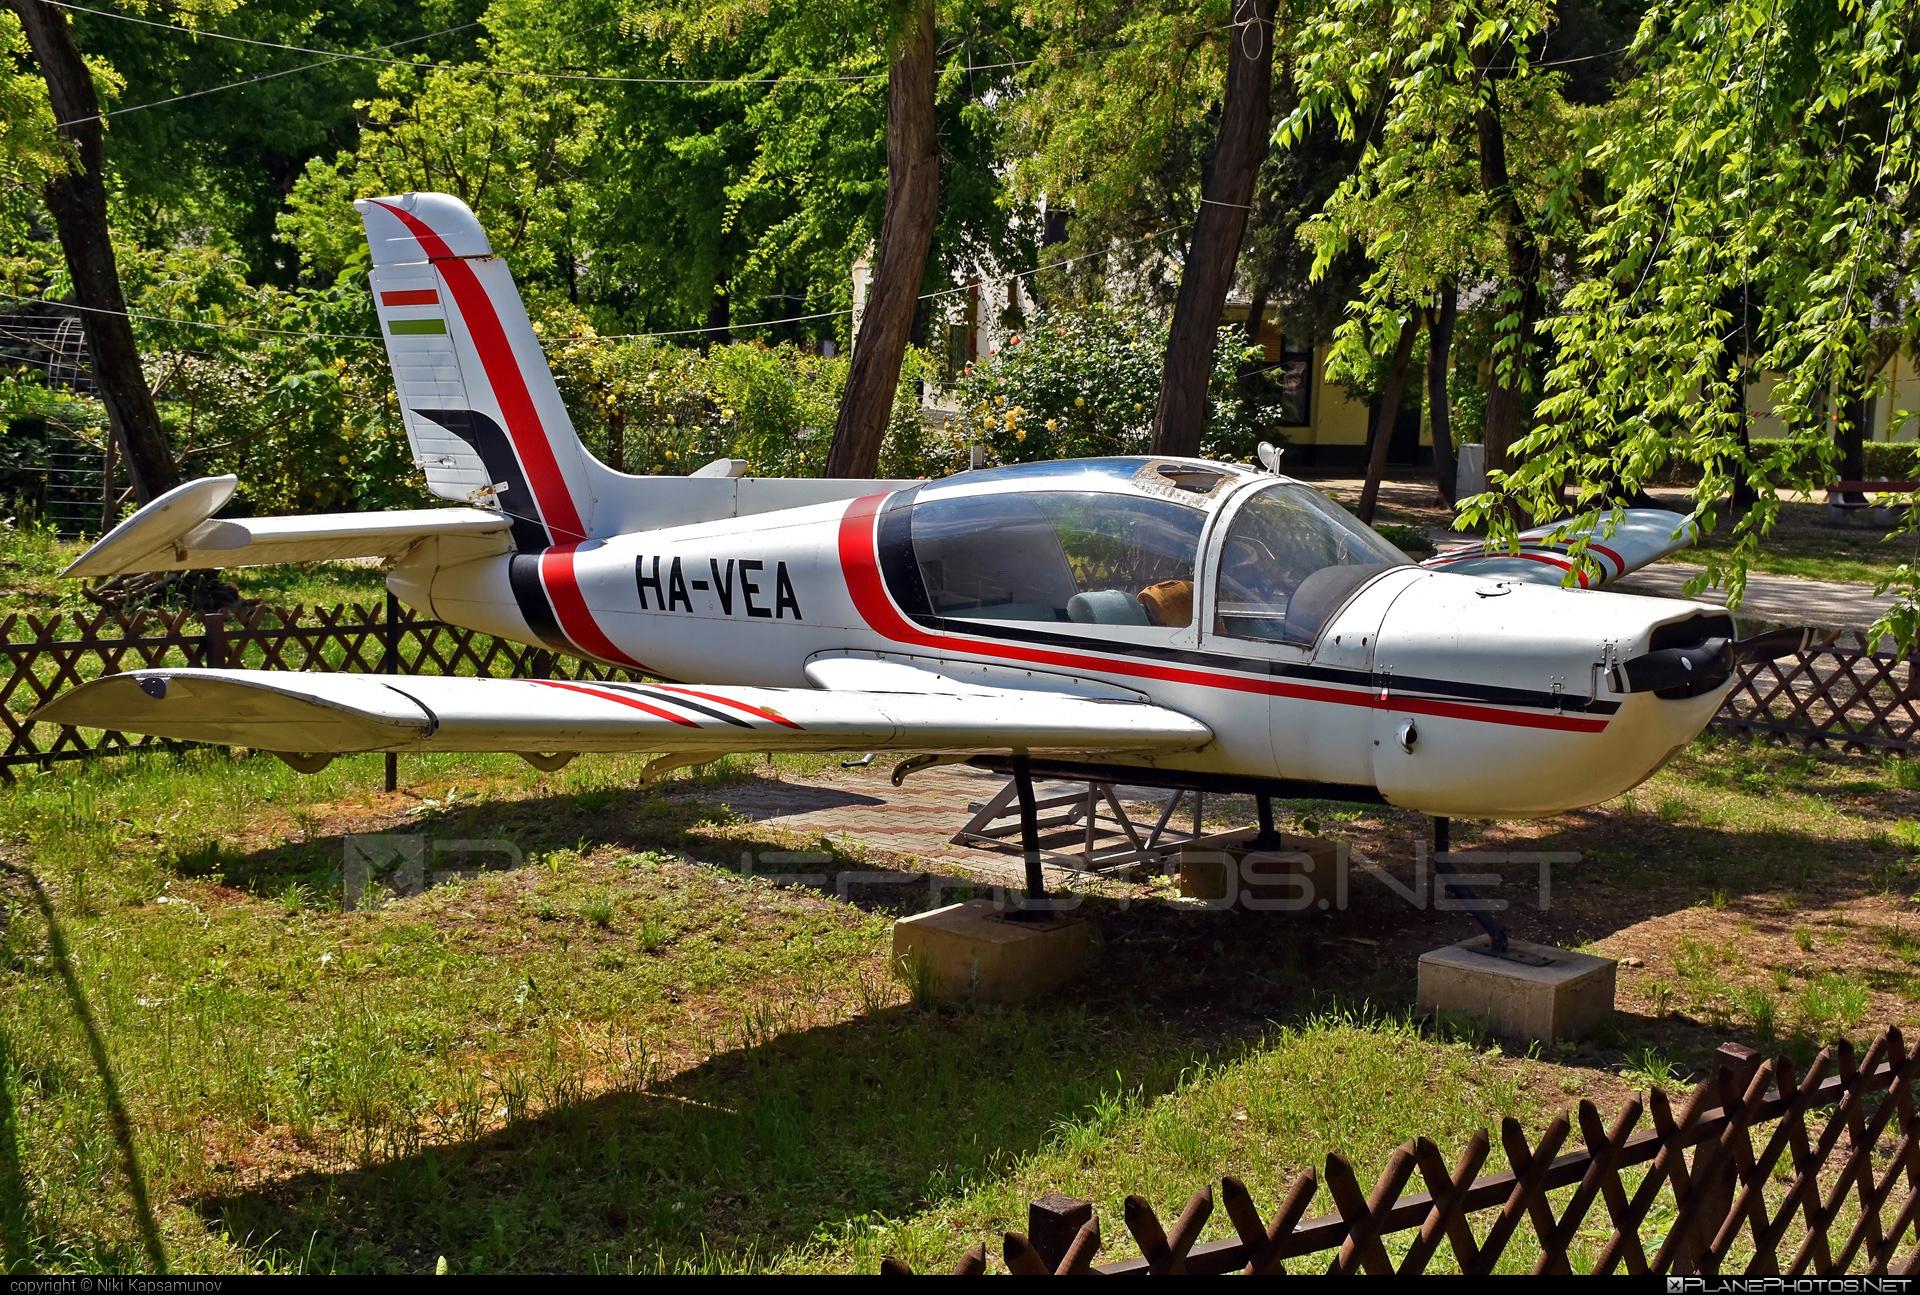 Socata MS.894 Rallye 220 - HA-VEA operated by Private operator #socata